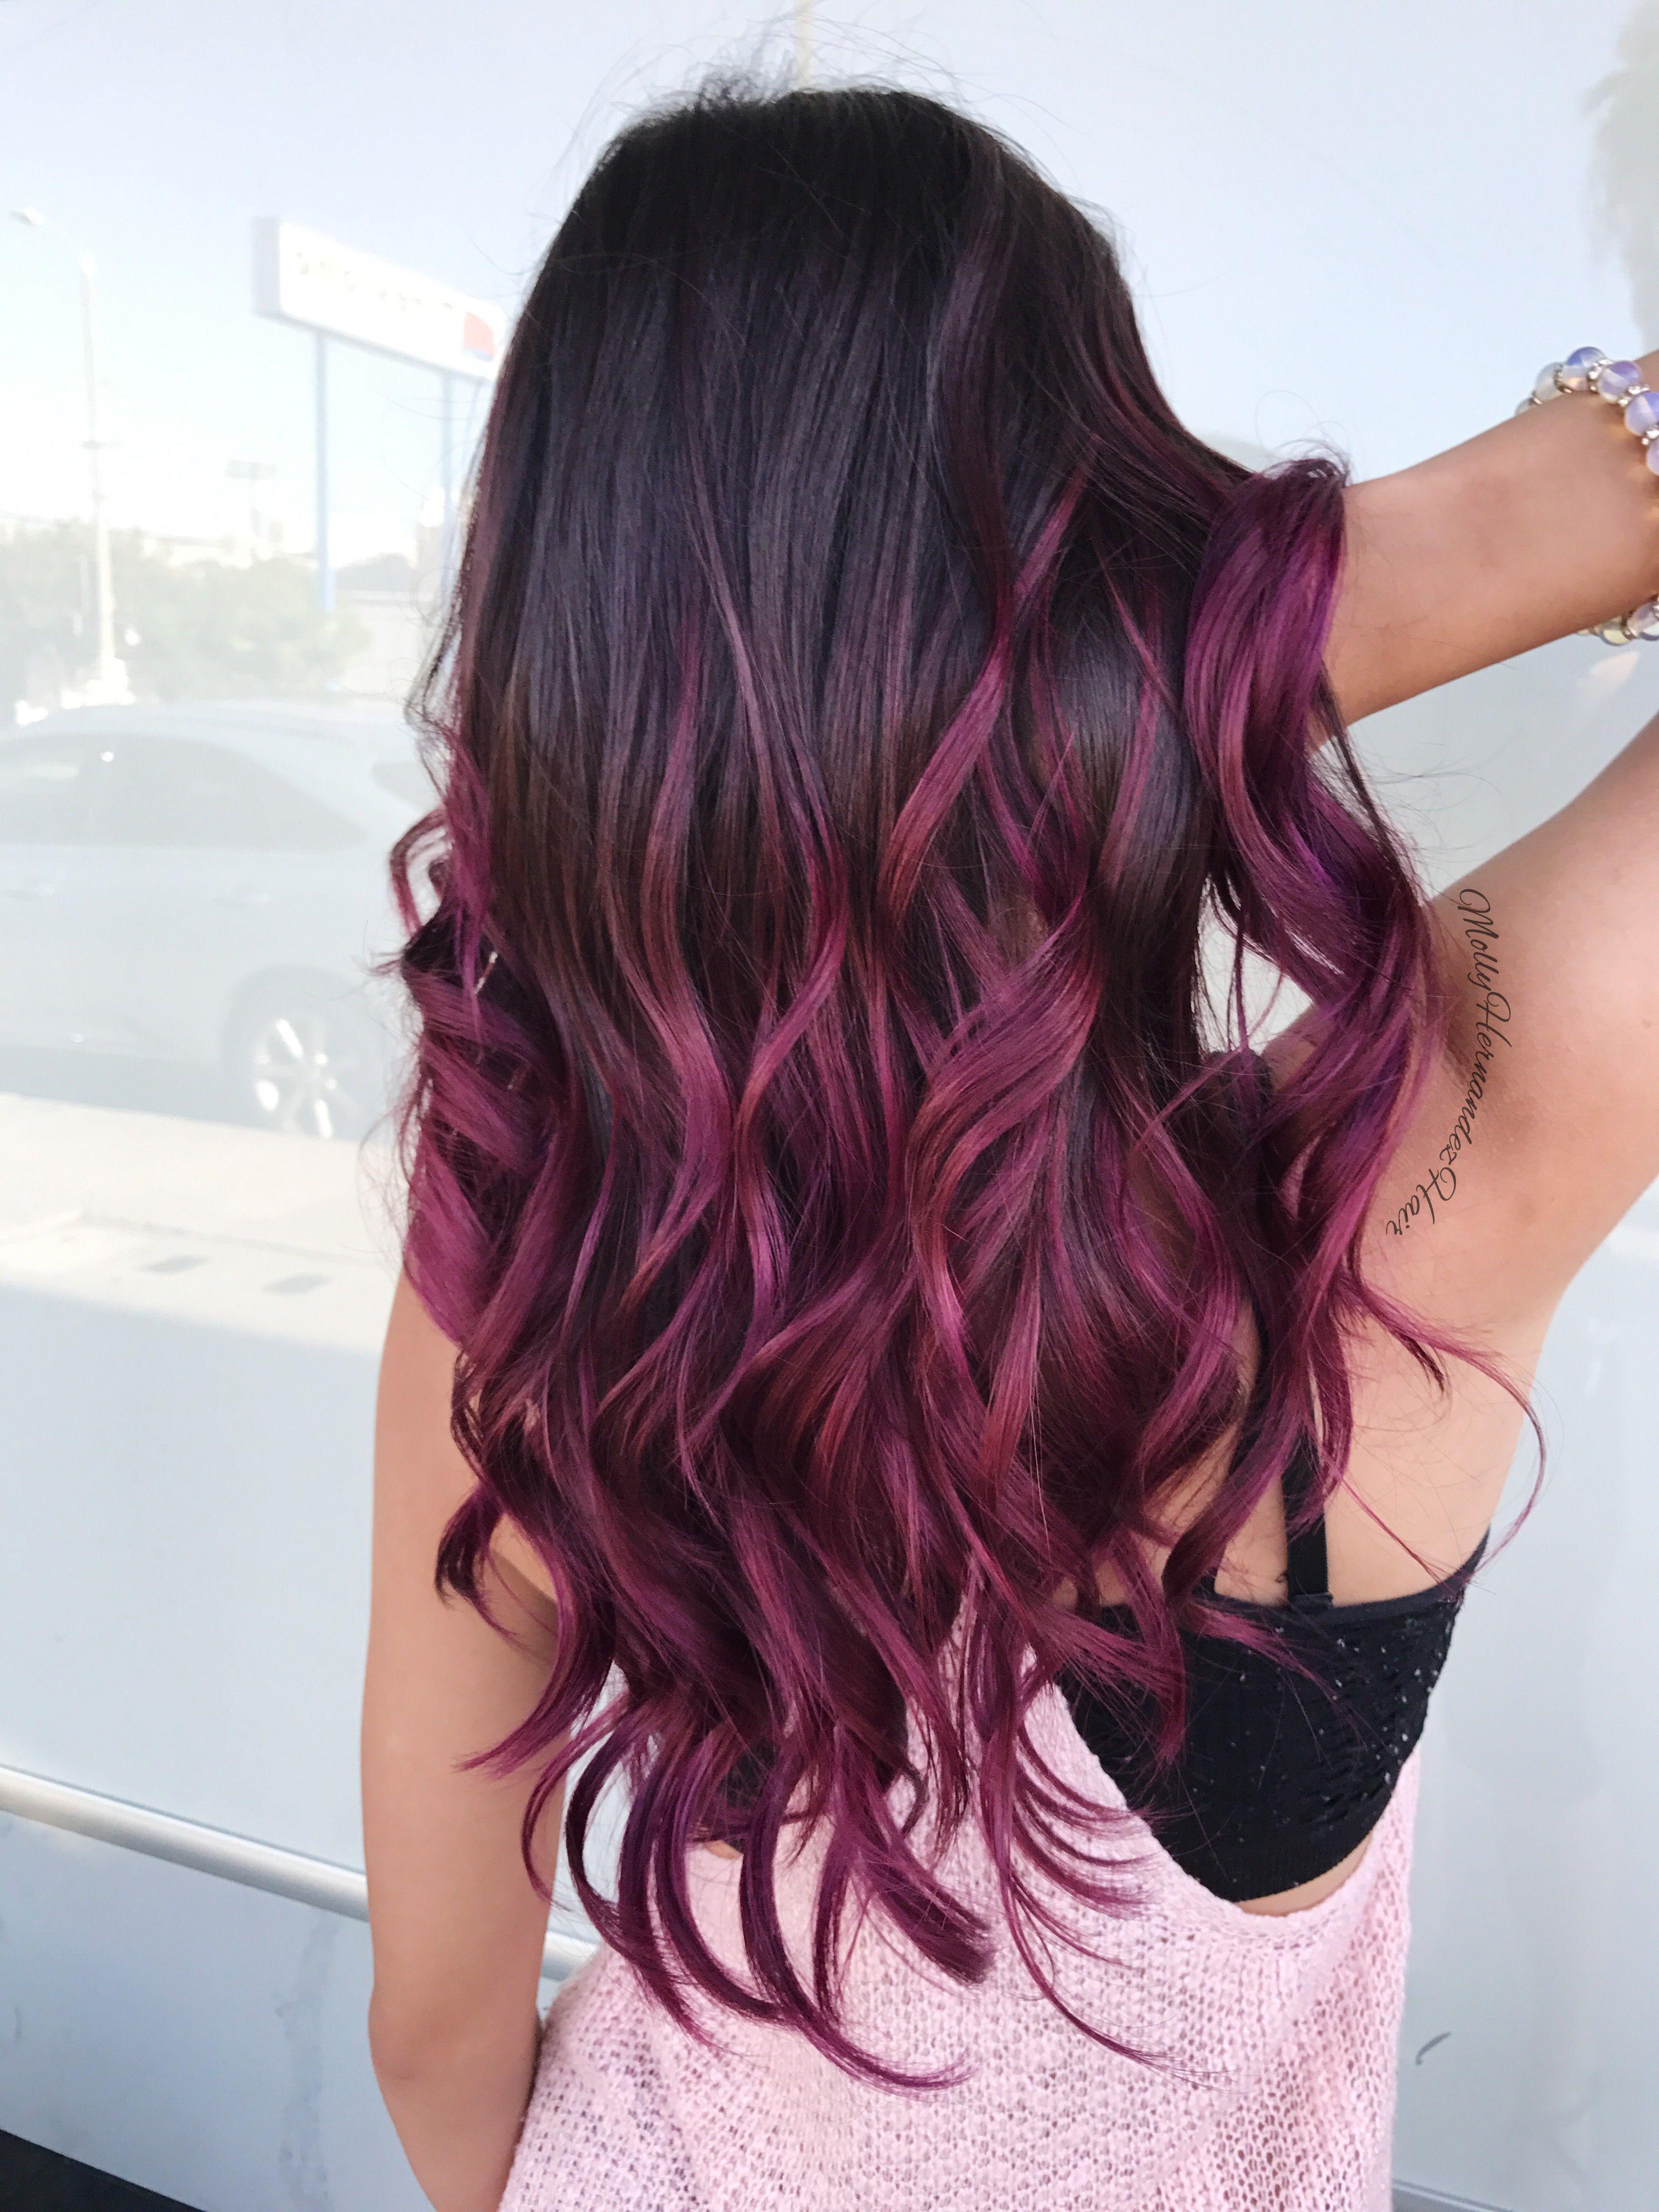 burgundy ombré, purple & magenta balayage, hair goals | hair (my